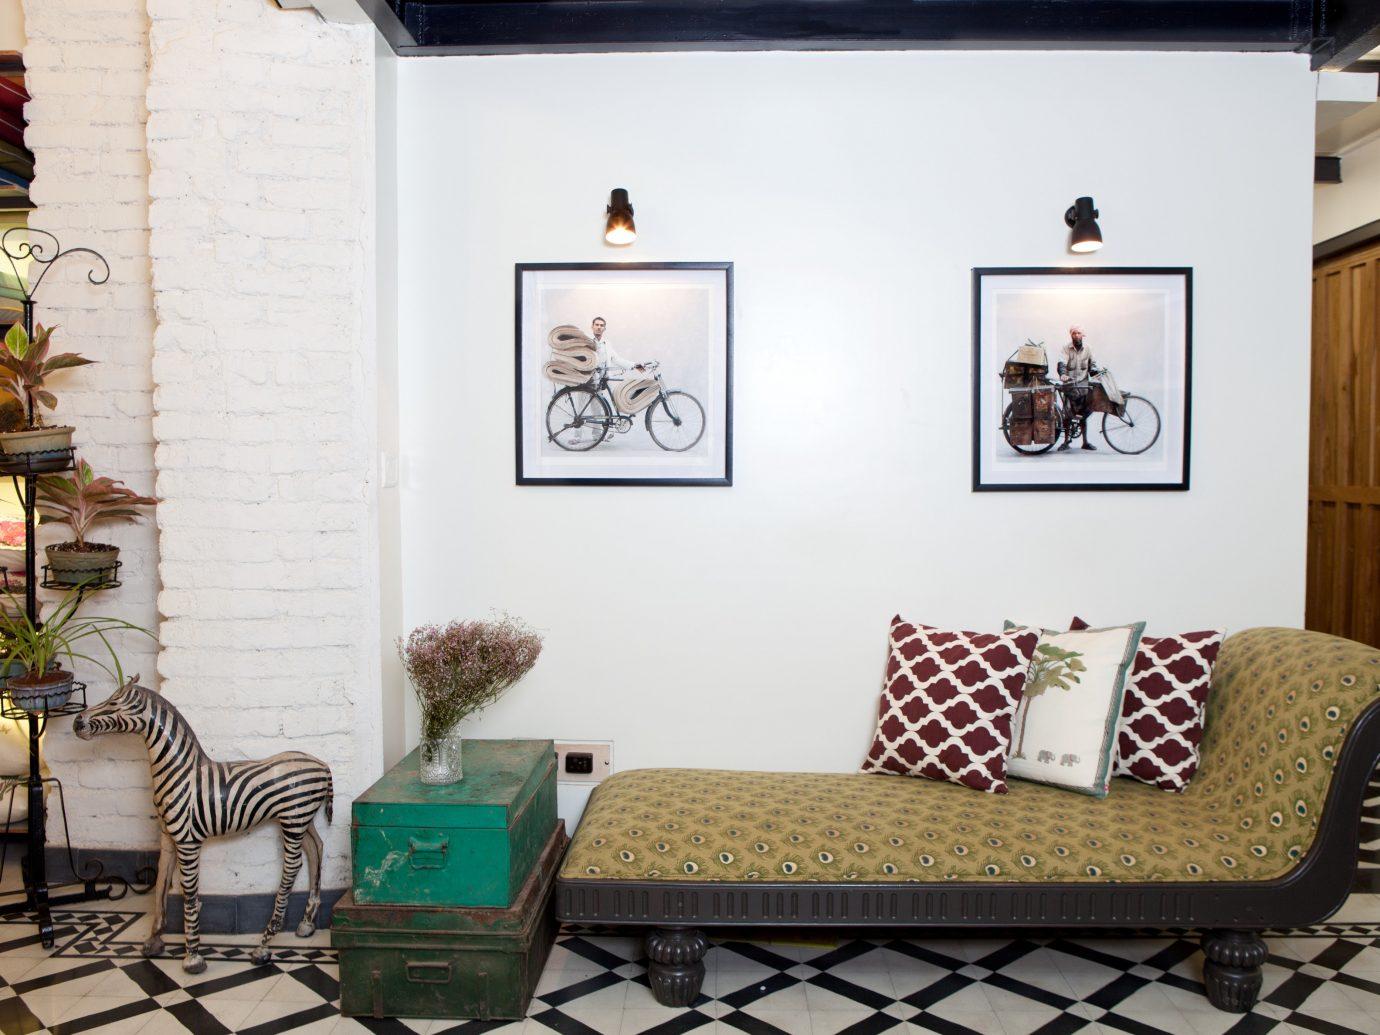 Hotels floor room indoor living room wall interior design home art Design furniture modern art area